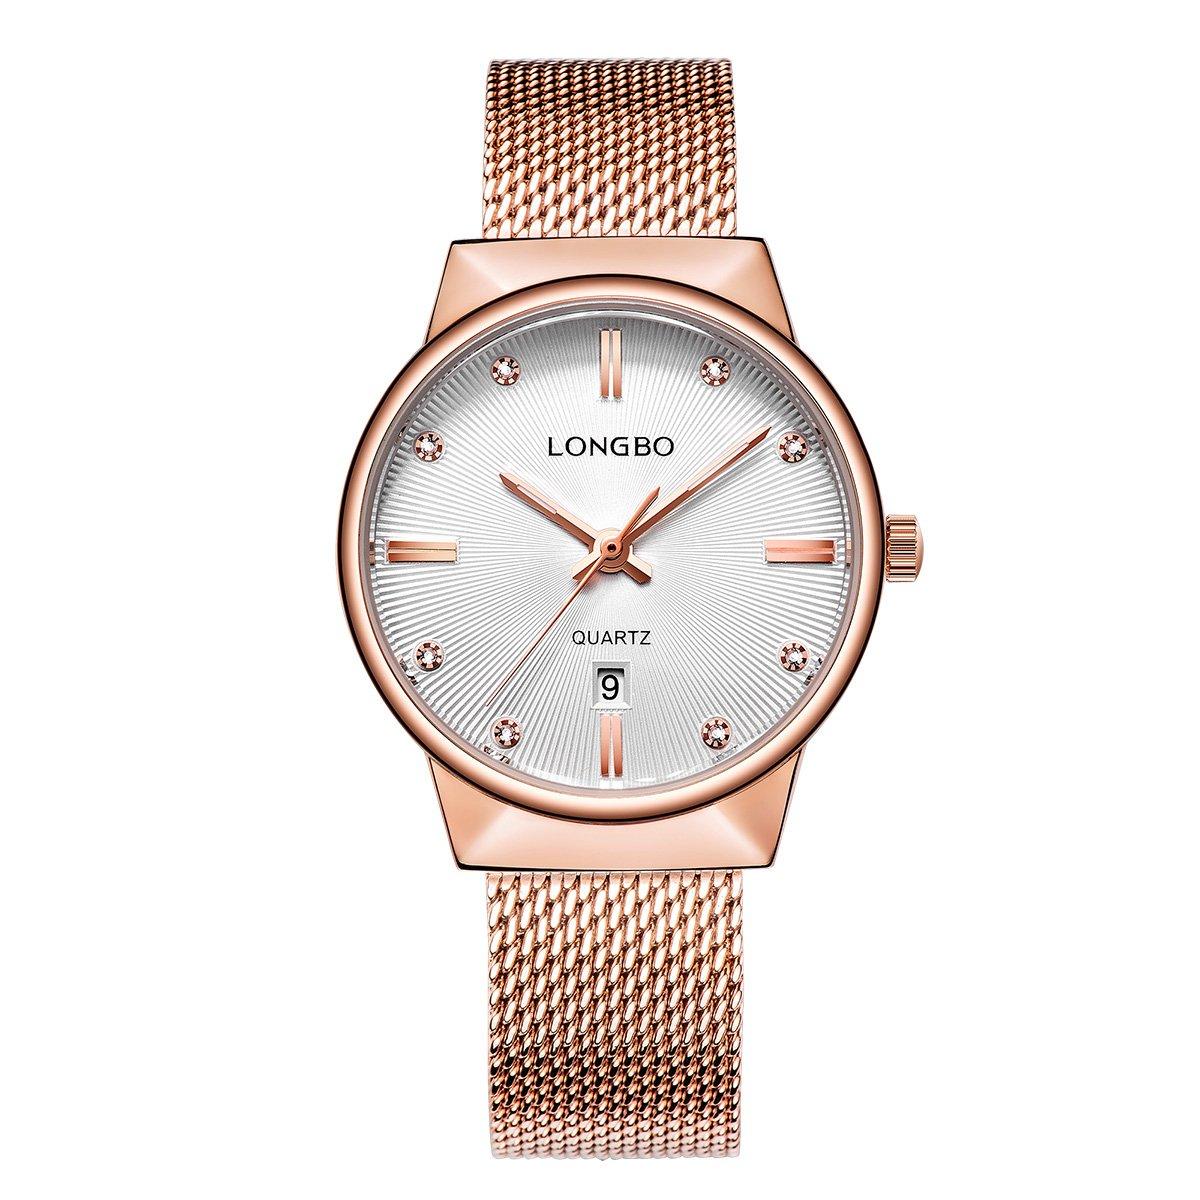 LONGBO Luxury Women's Rose Gold Metal Mesh Strap Analog Quartz Business Watch Auto Date Calendar Elegant Watch Waterproof Rhinestone Dial Wristwatch For Woman